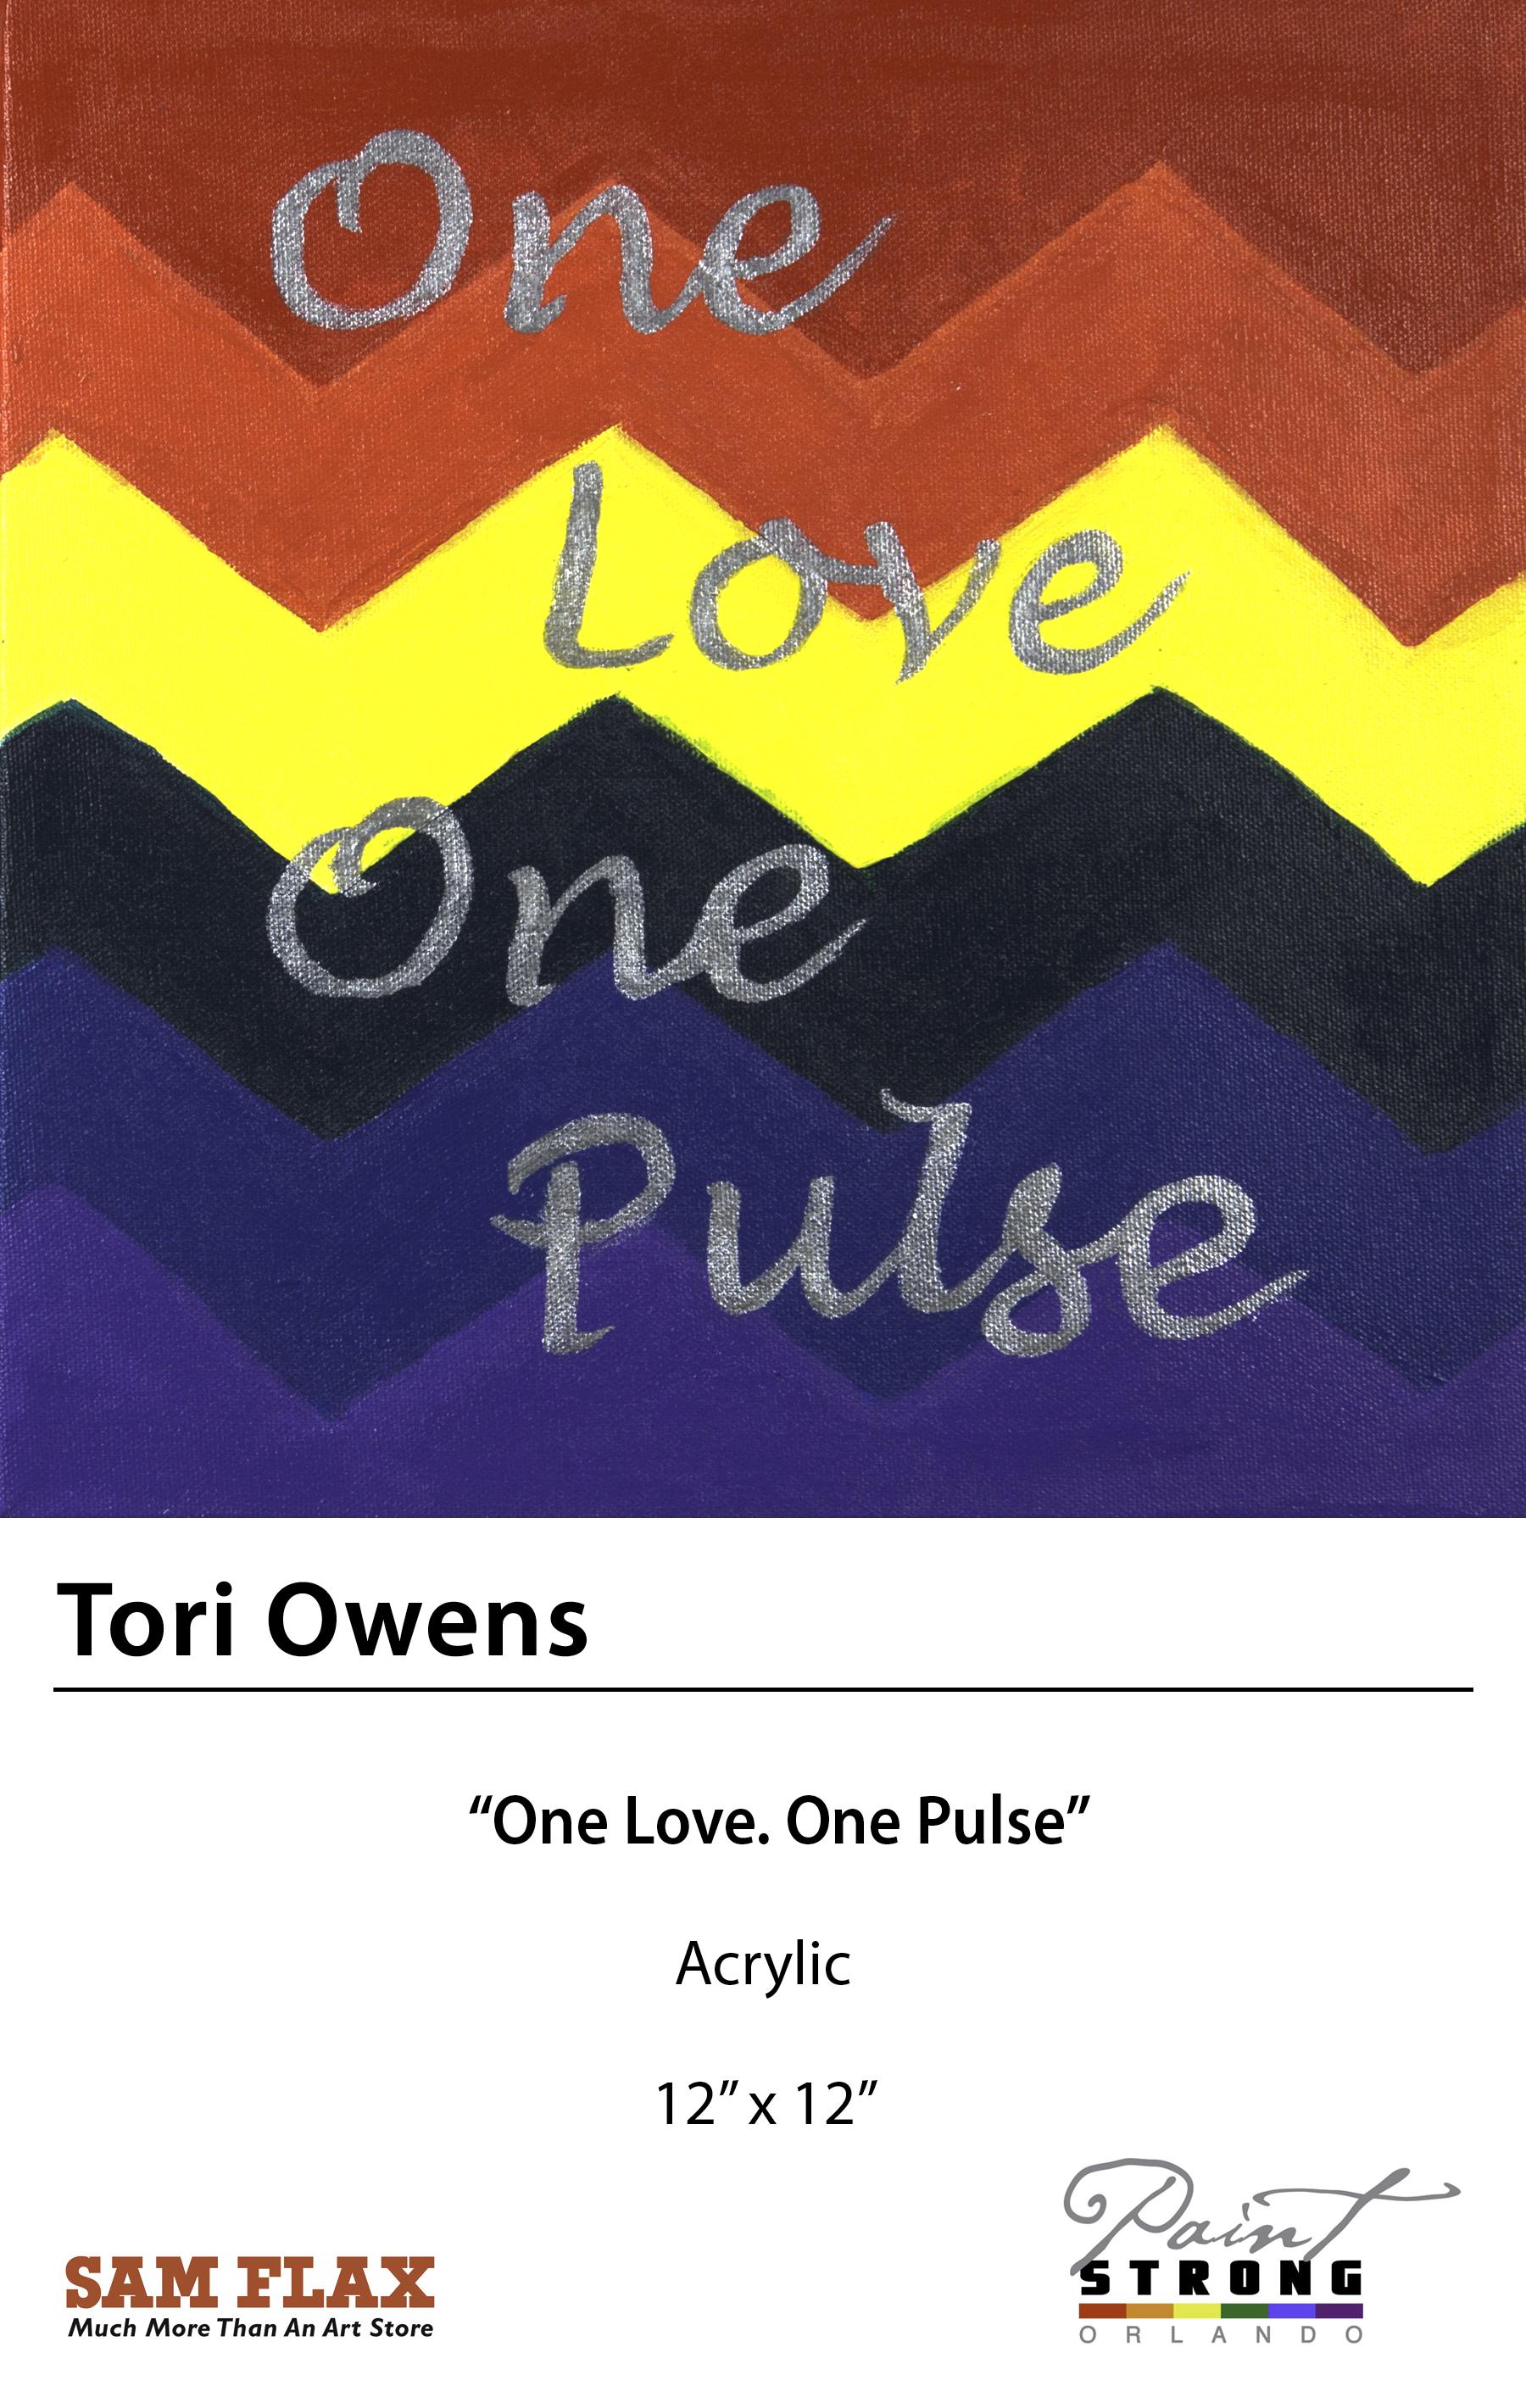 Tori Owens